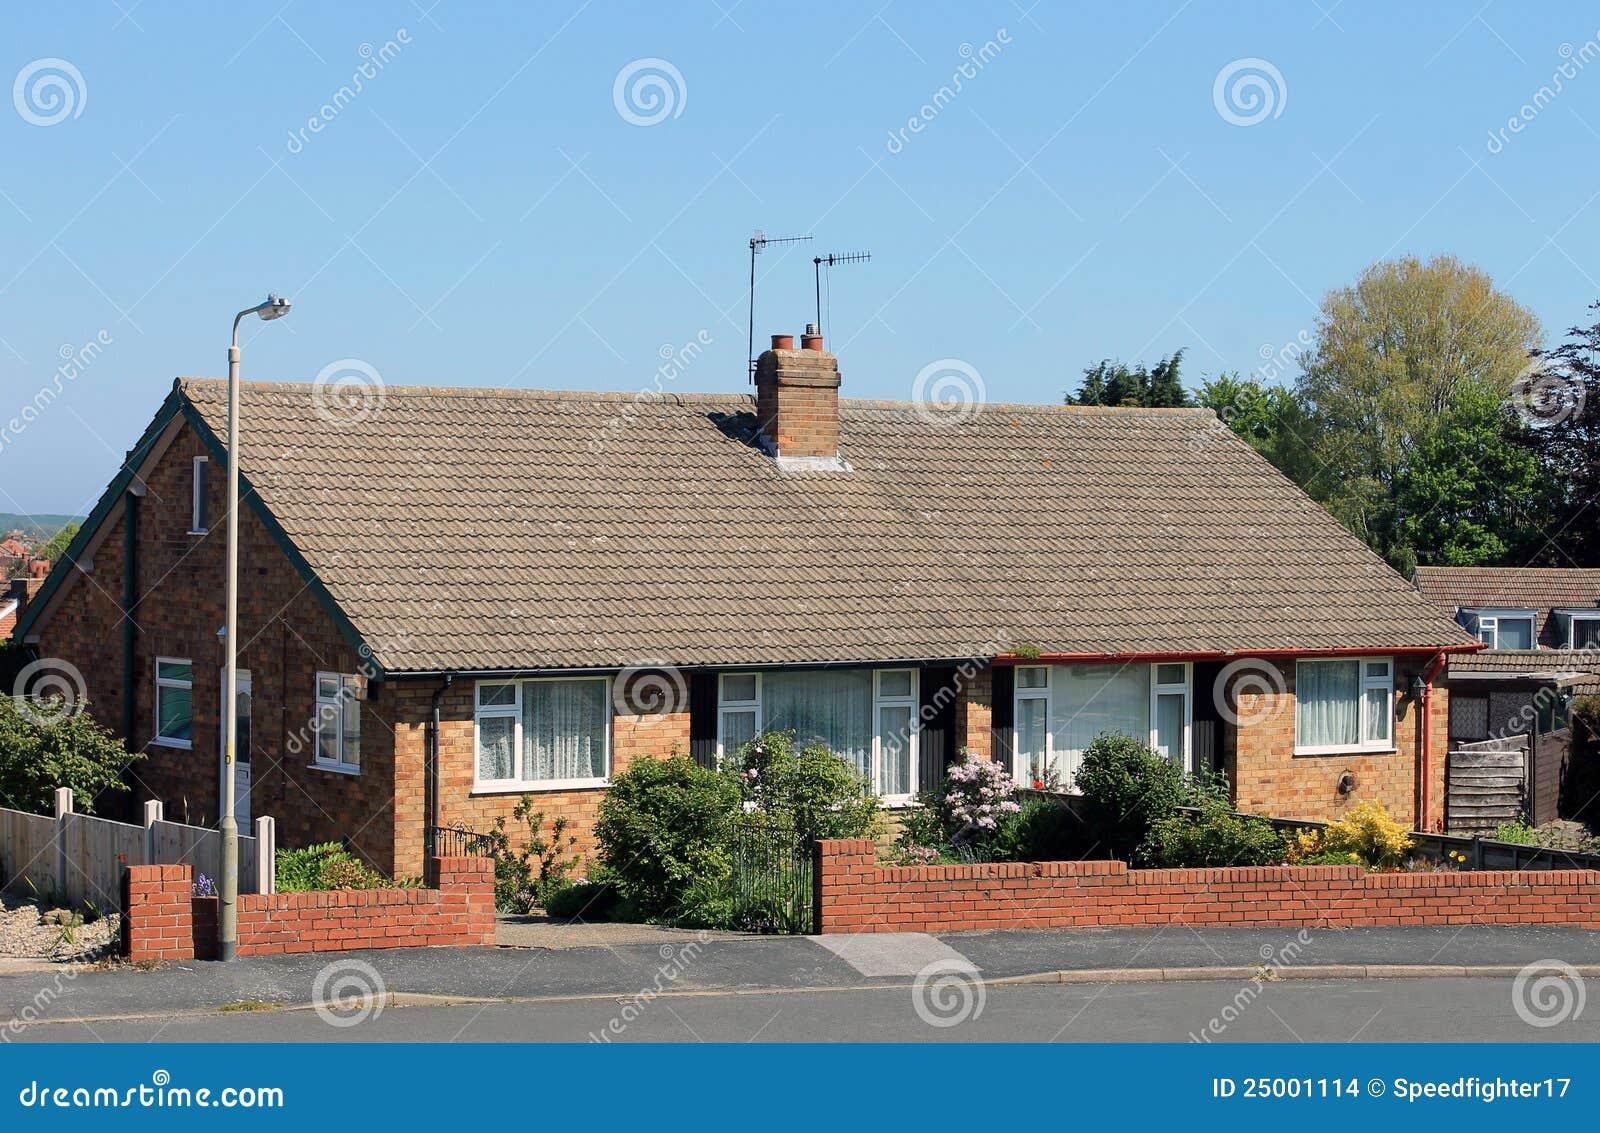 Casas inglesas de la casa de planta baja imagenes de - Planta baja en ingles ...